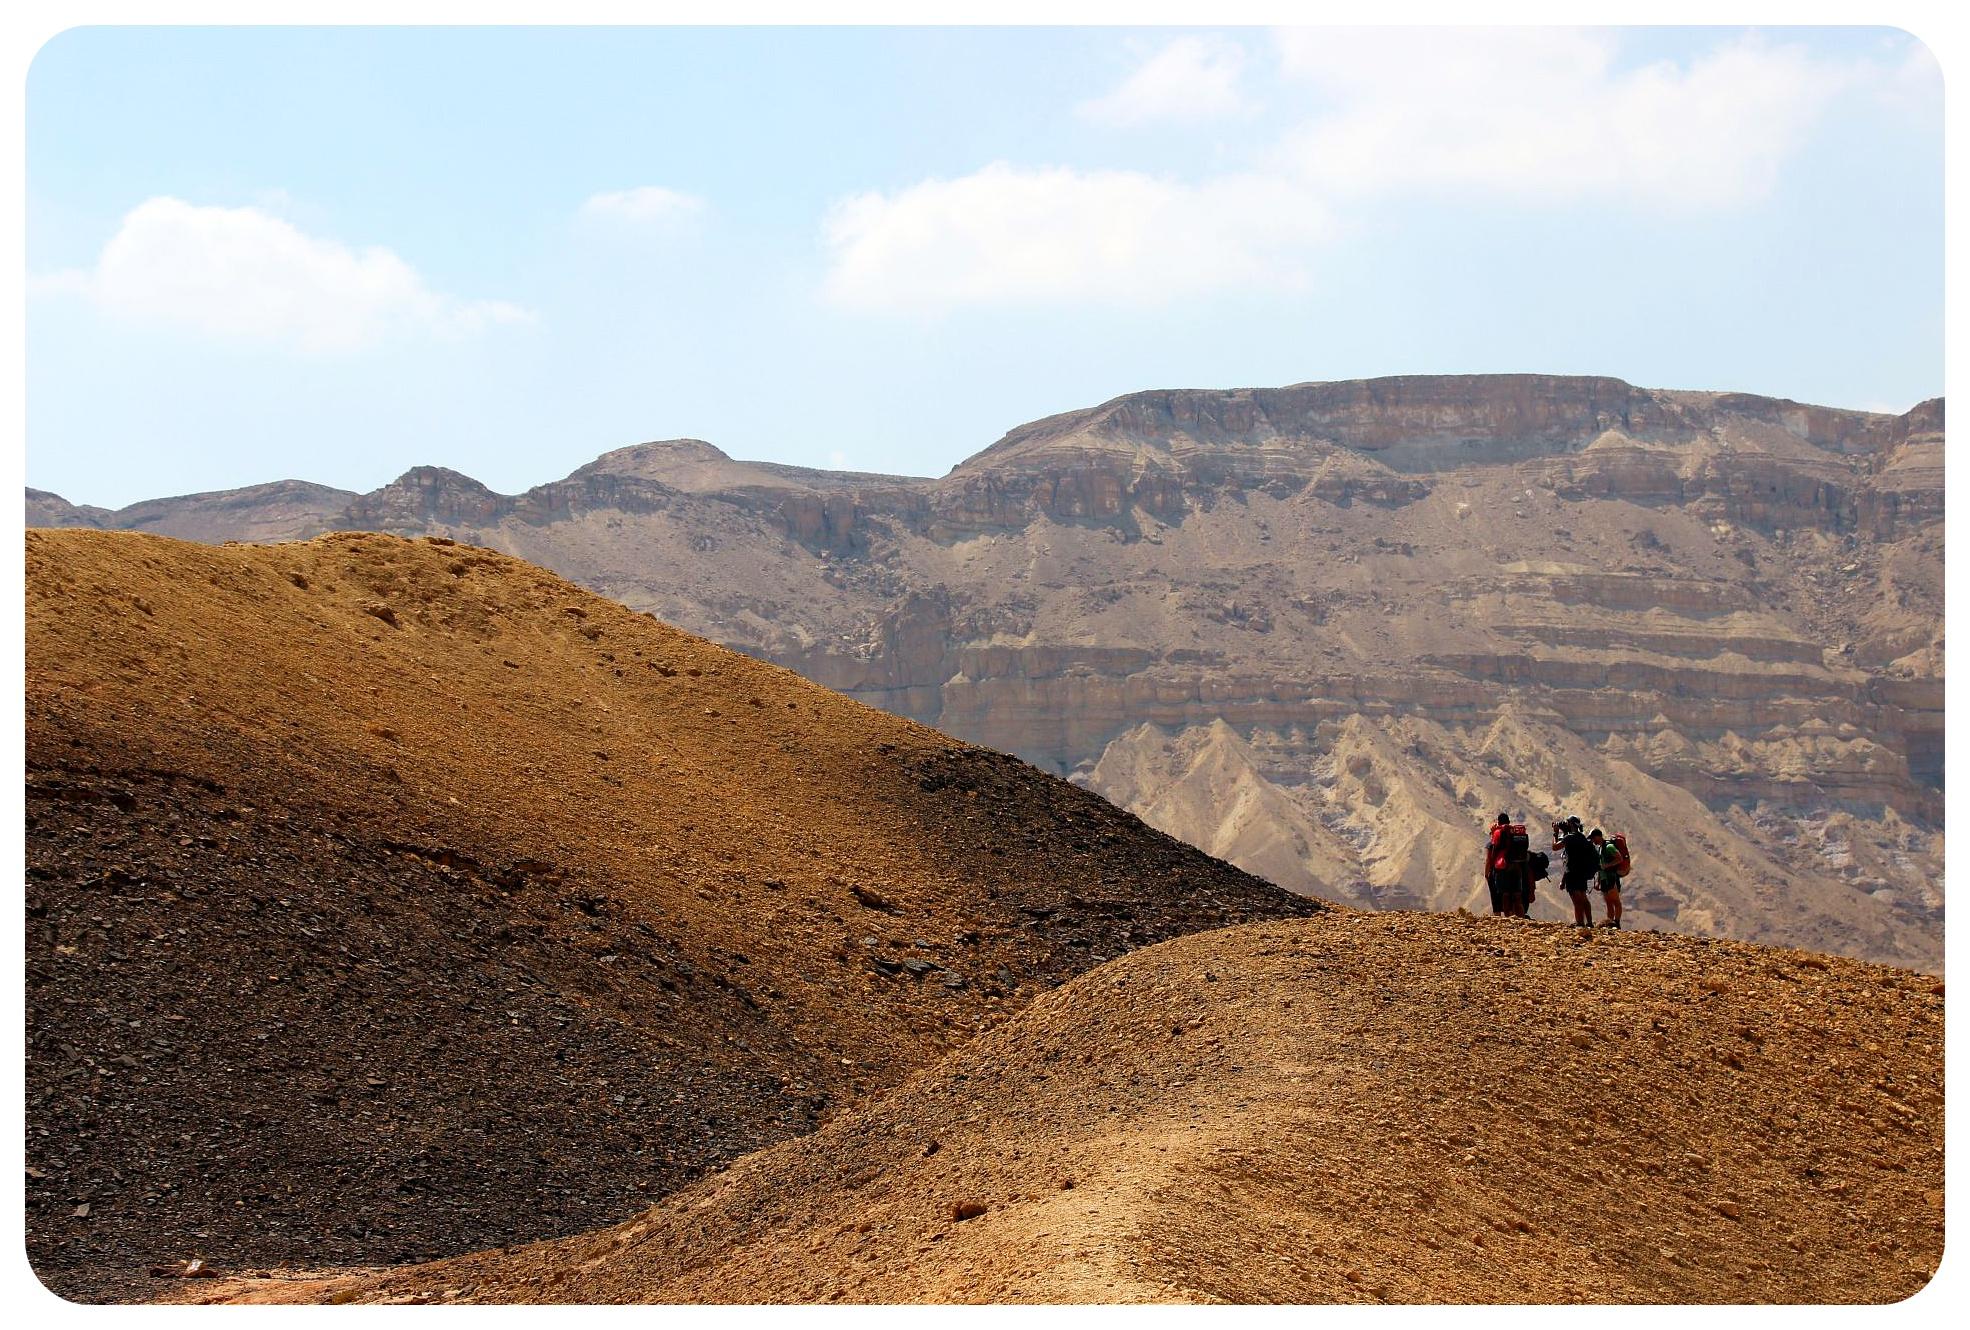 makhtesh katan hikers israel